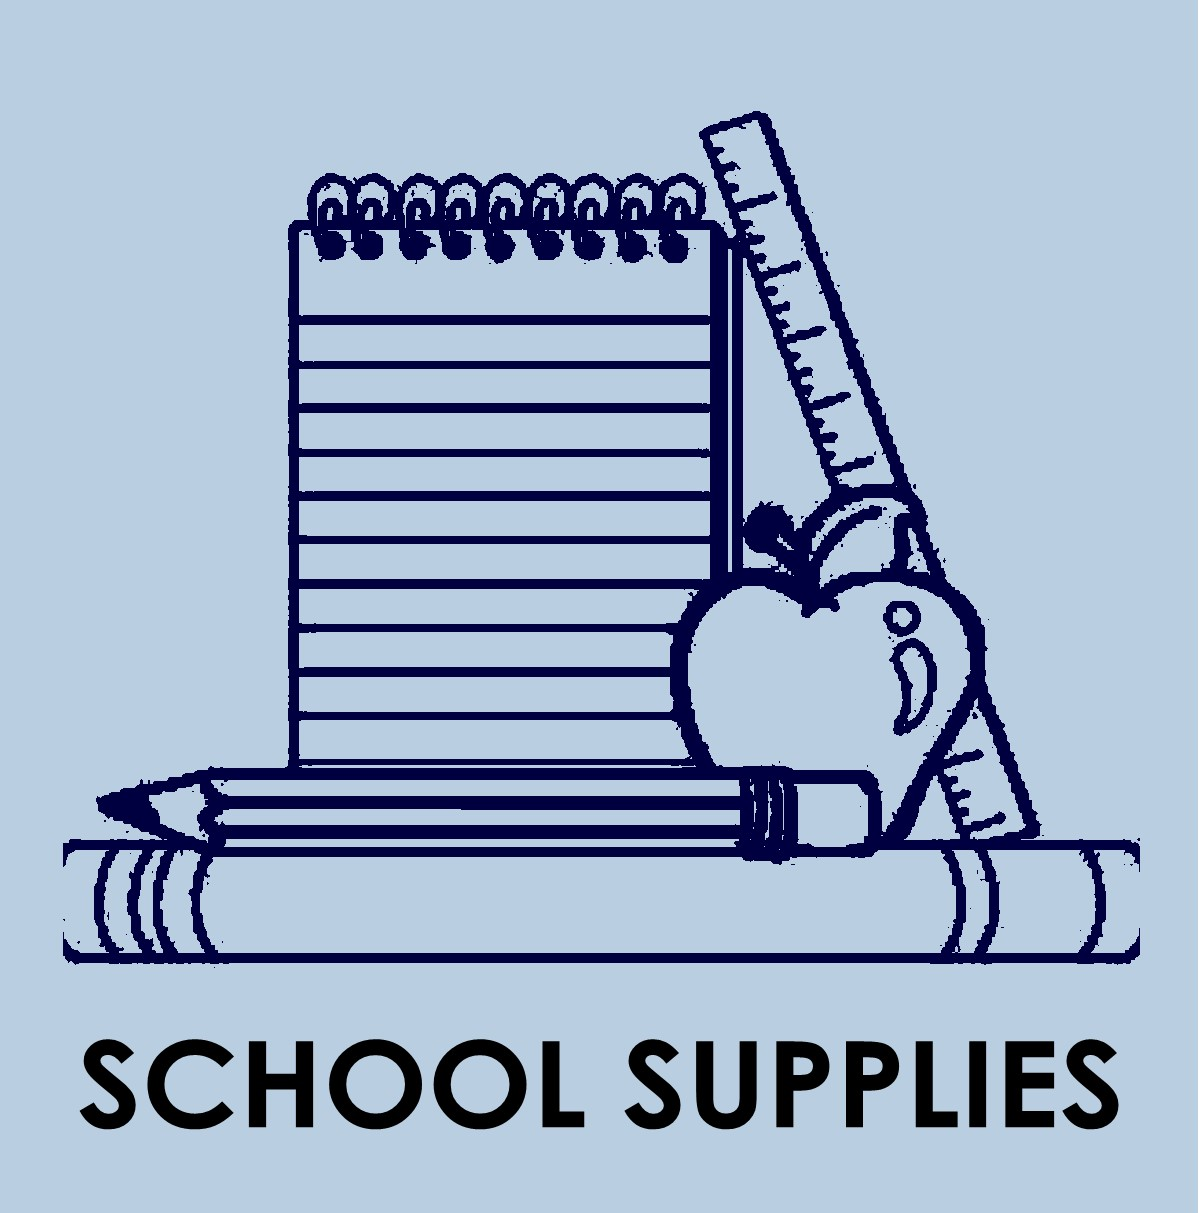 school supplies pic.jpg